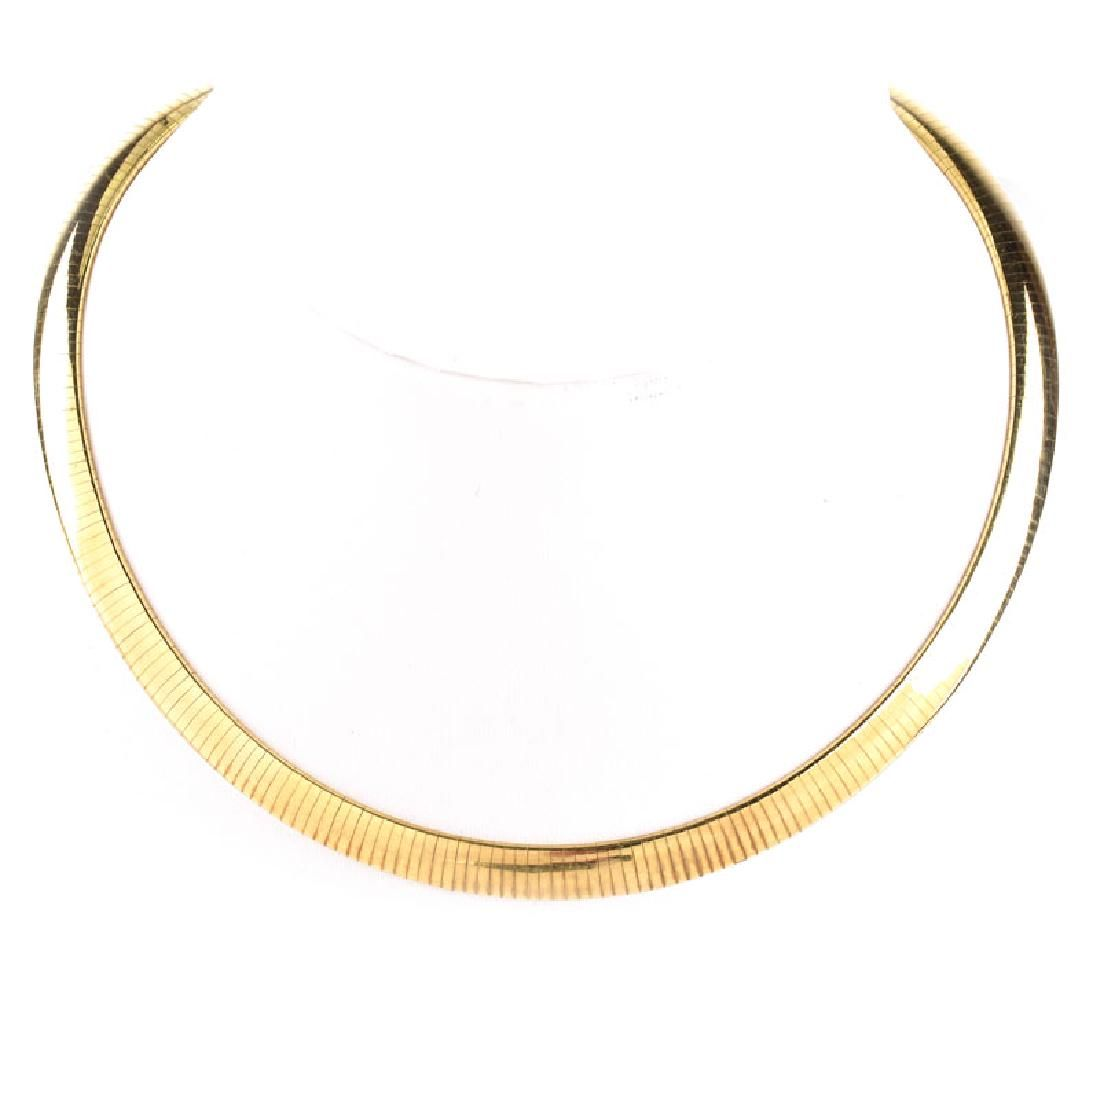 Vintage Italian 14 Karat Yellow Gold Choker Necklace.